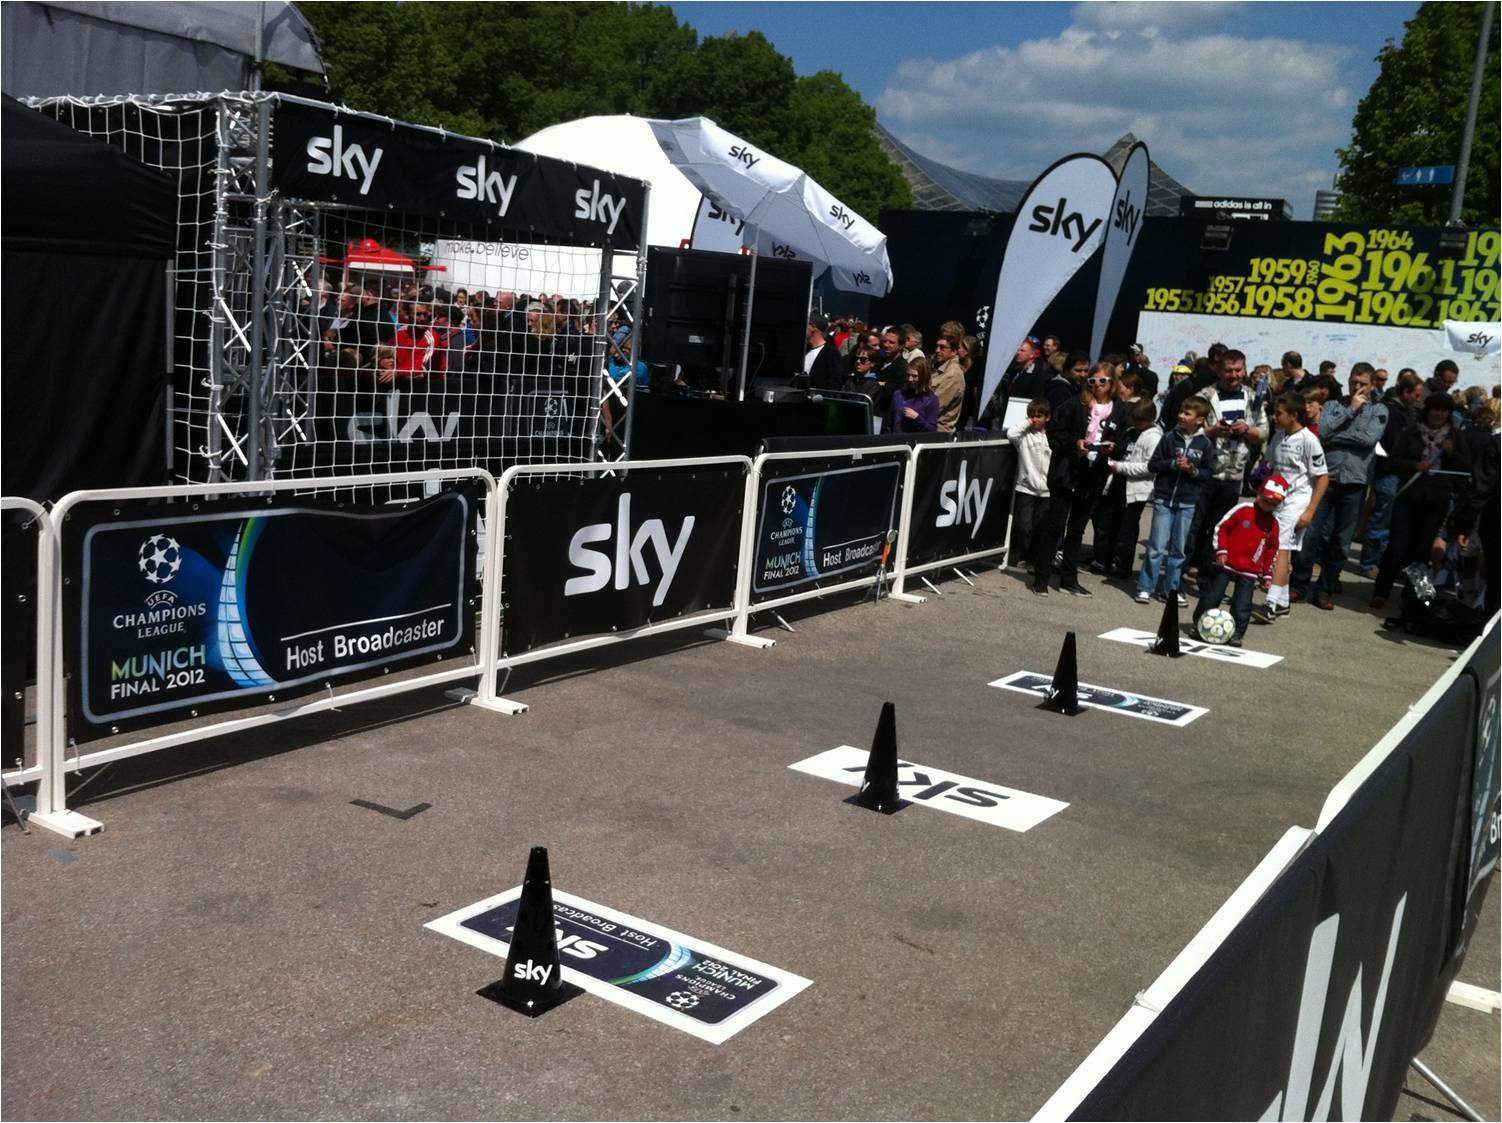 Dribbleparcours für SKY